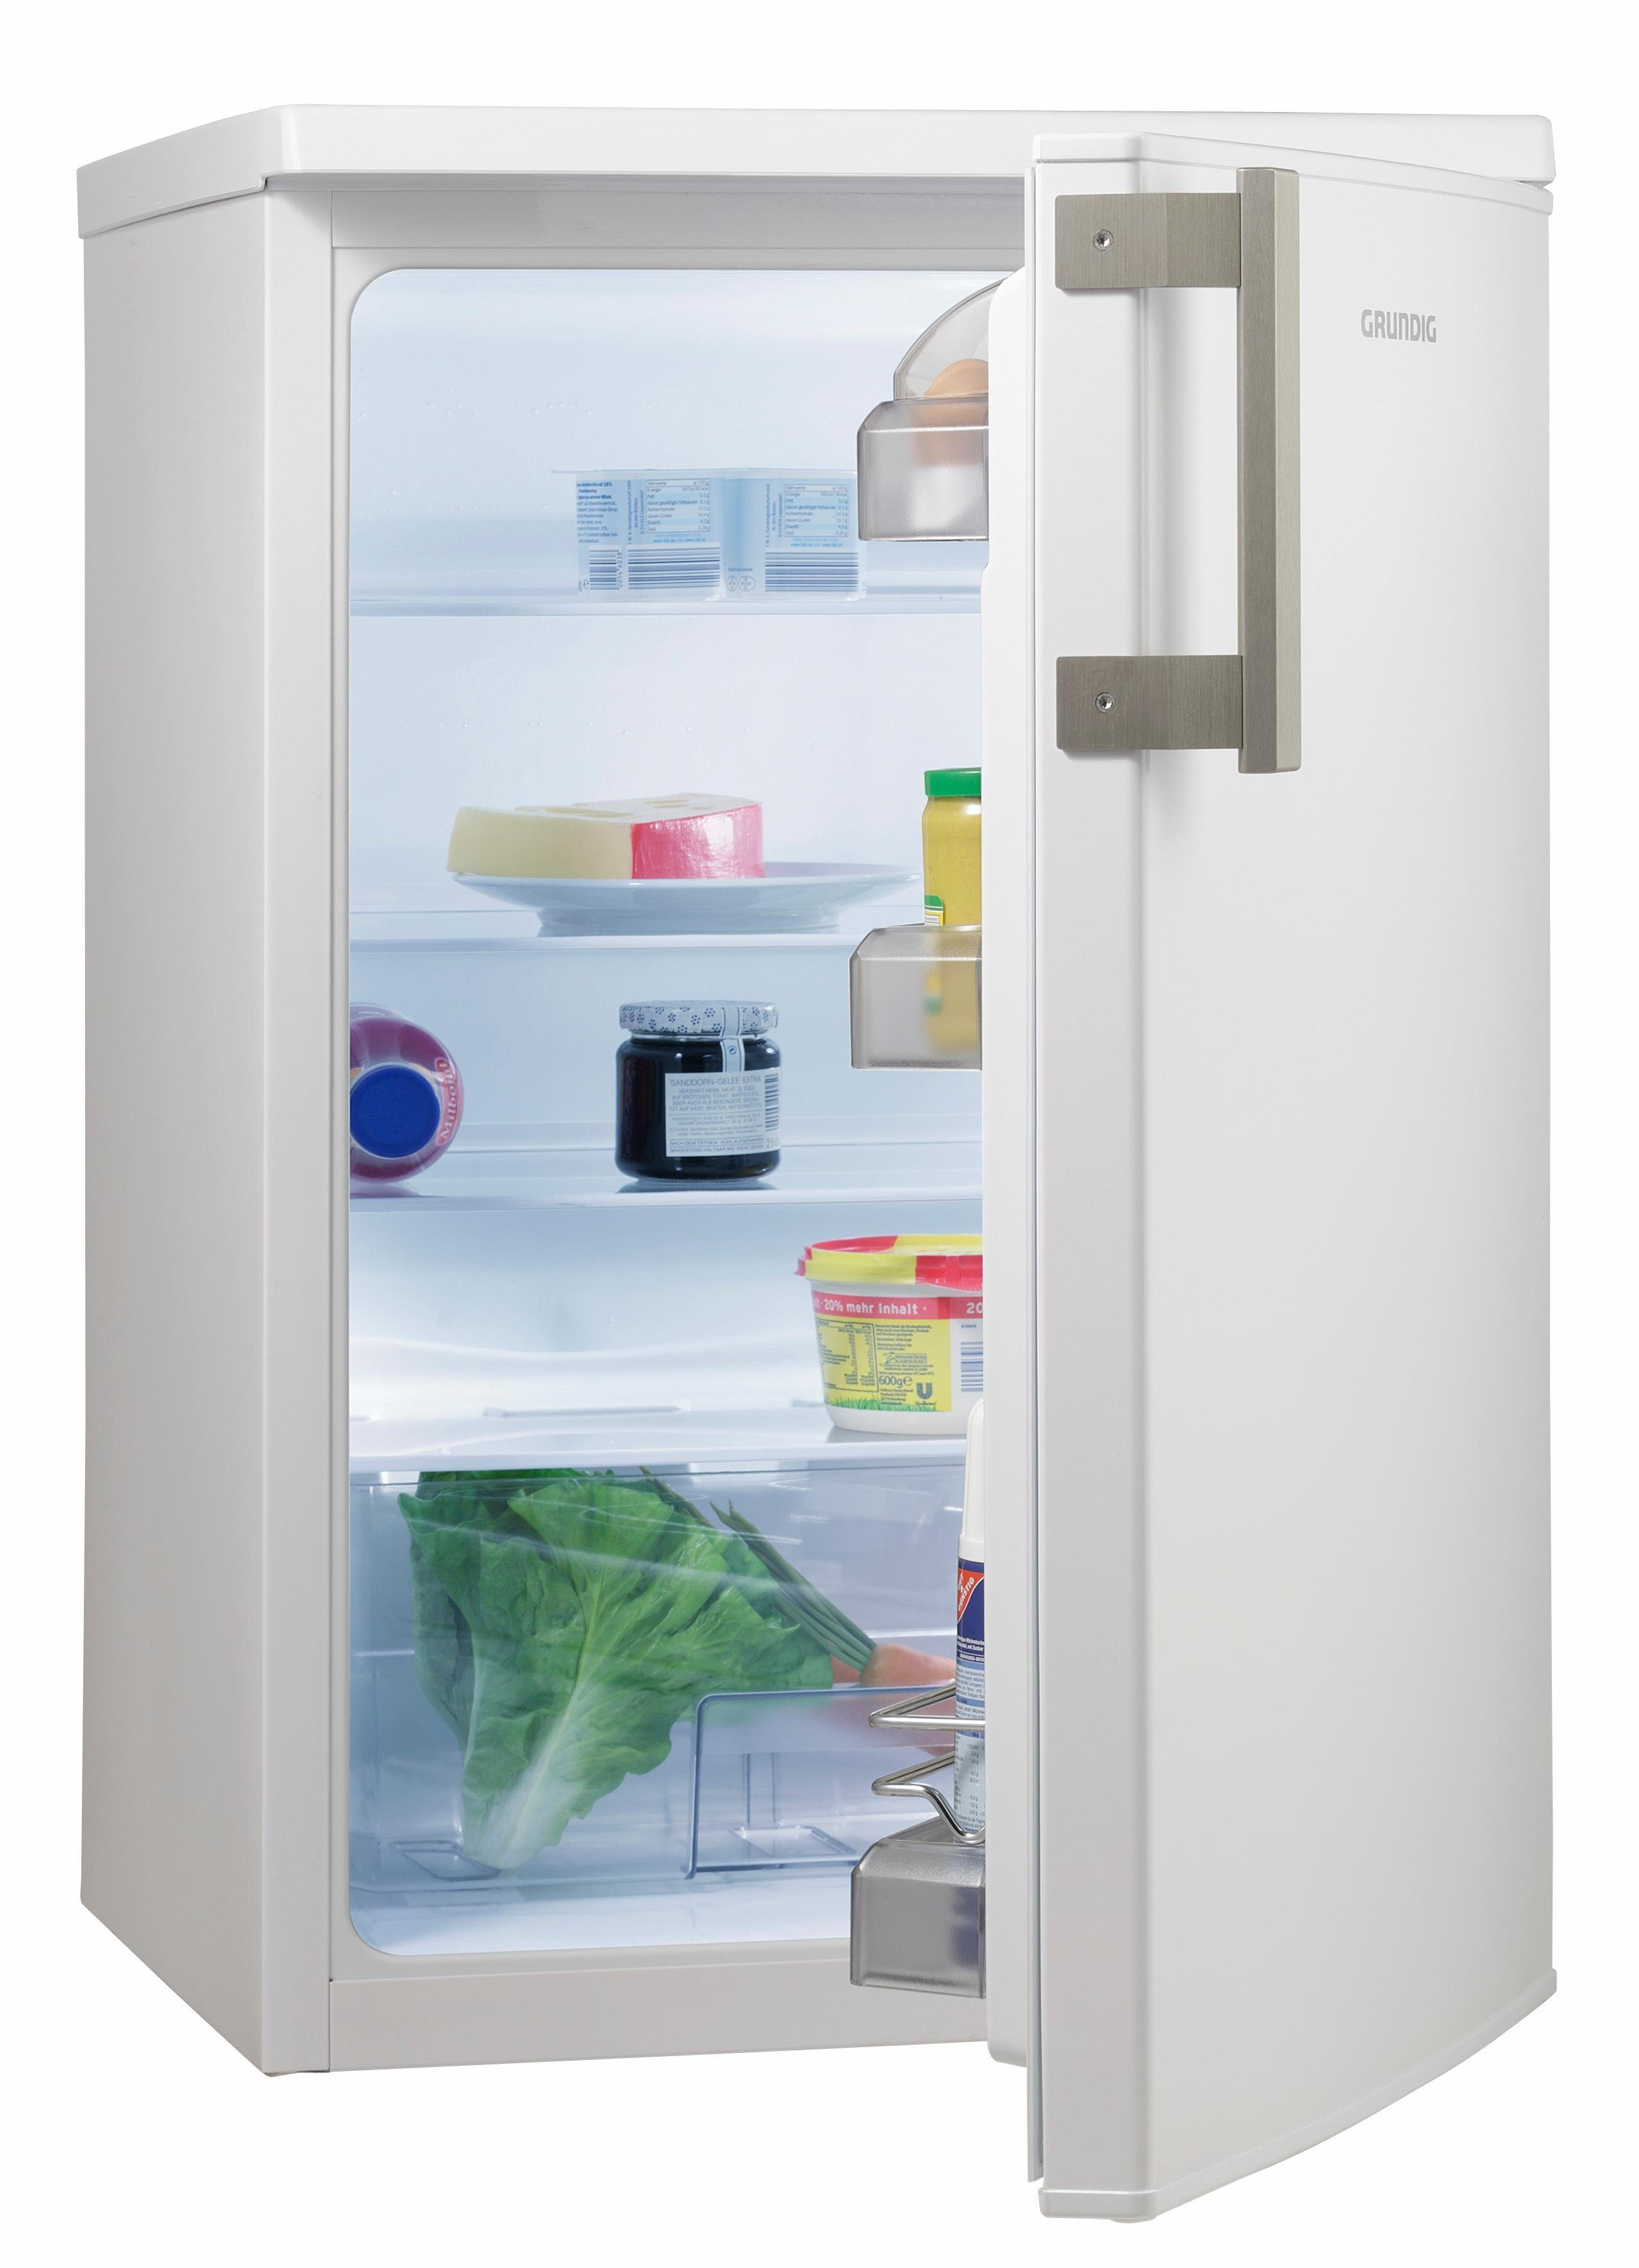 Grundig Kühlschrank GTM 10120, A++, 84 cm hoch